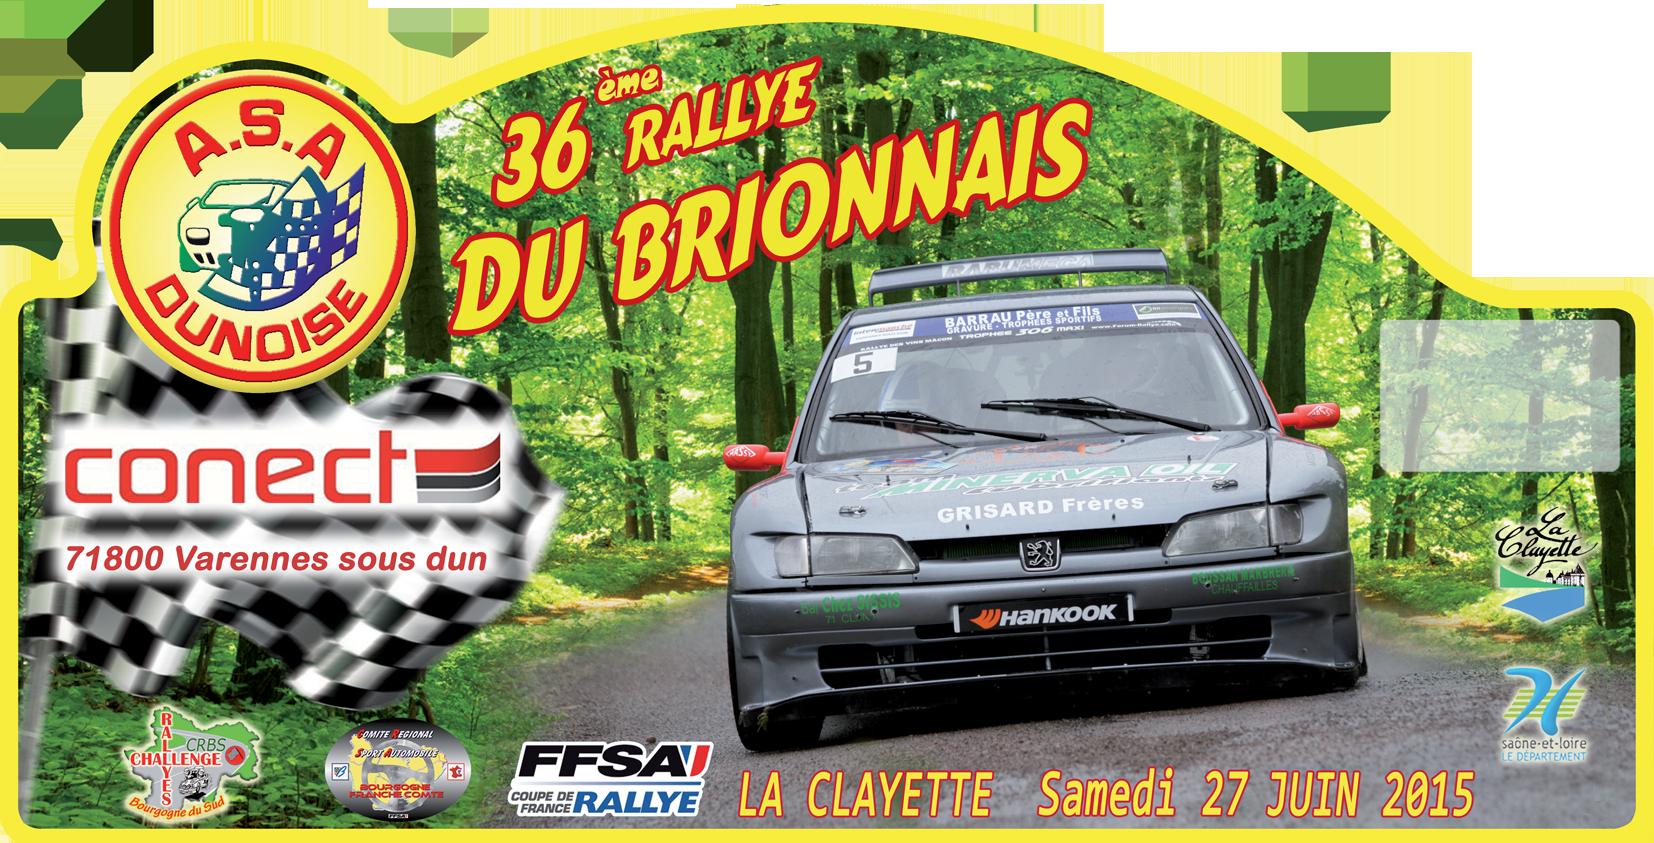 Rallye-du-Brionnais-2015